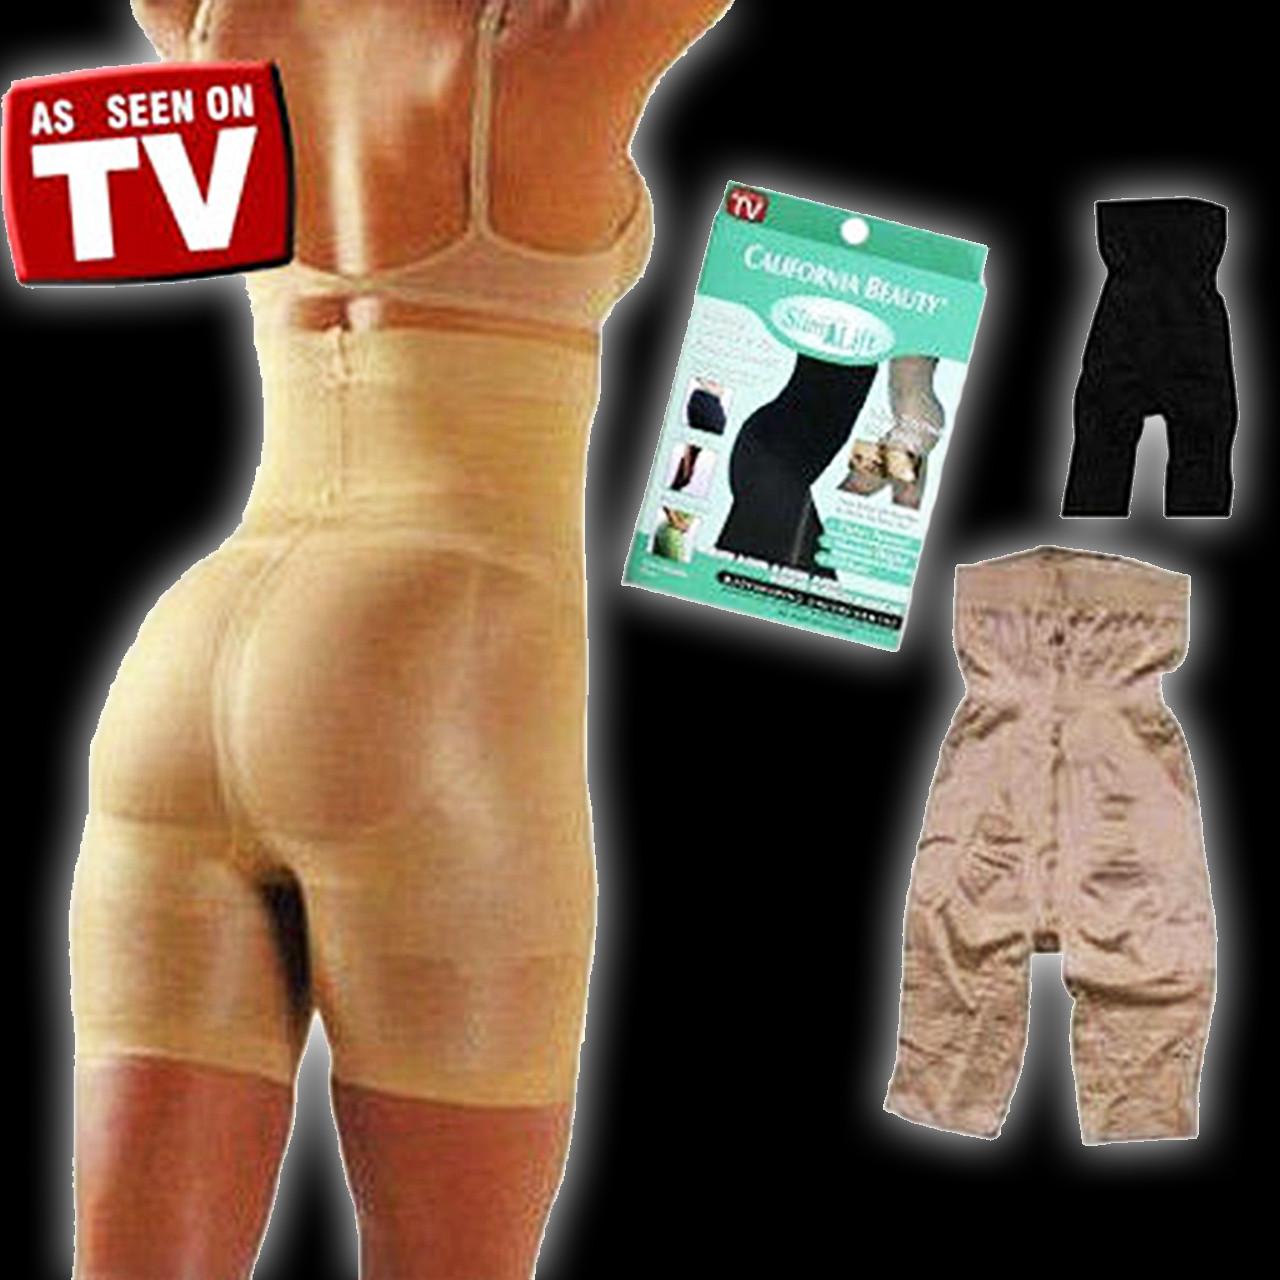 Утягивающее белье шорты California Beauty Slim N Lift коррекция фигуры - Интернет-магазин sevenMART  в Одессе